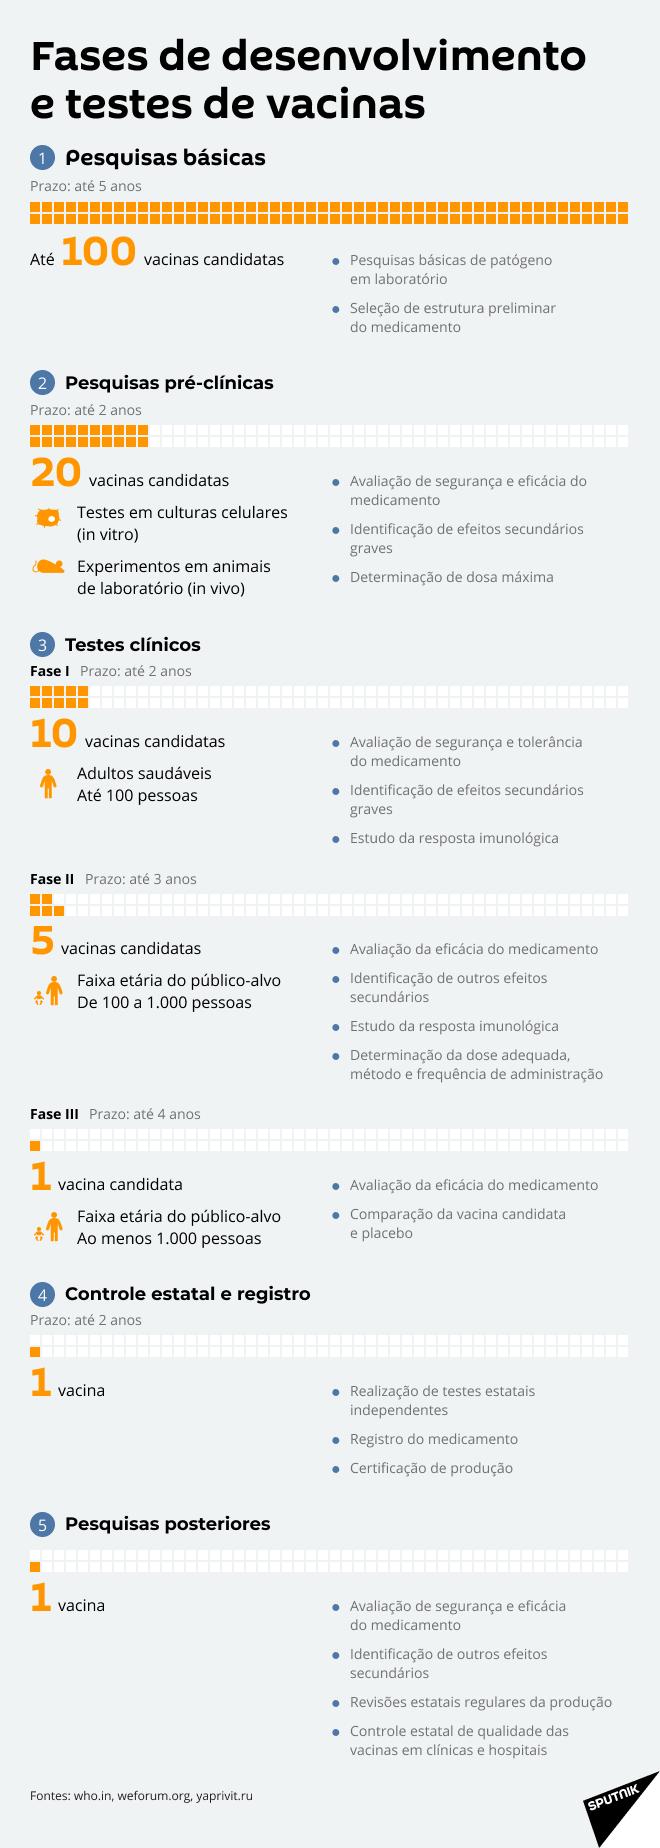 Fases de desenvolvimento de vacinas